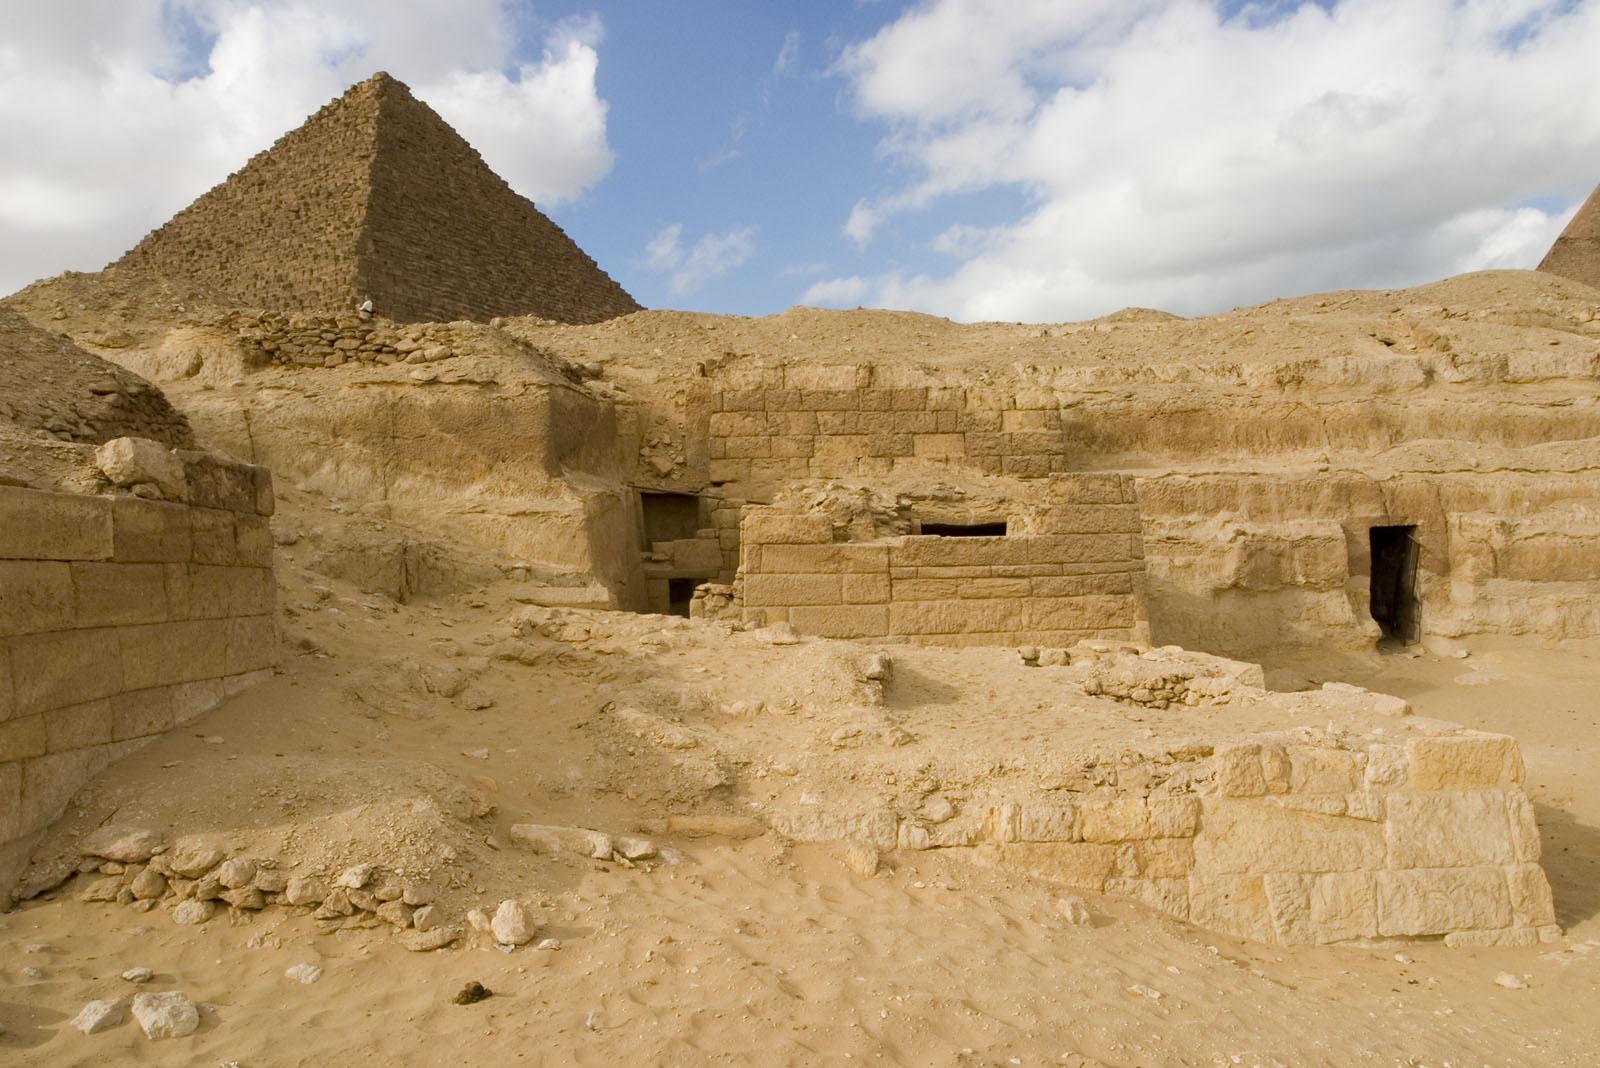 Menkaure quarry cemetery: Site: Giza; View: MQ 134, MQ 135, MQ 120, MQ 124, MQ 121